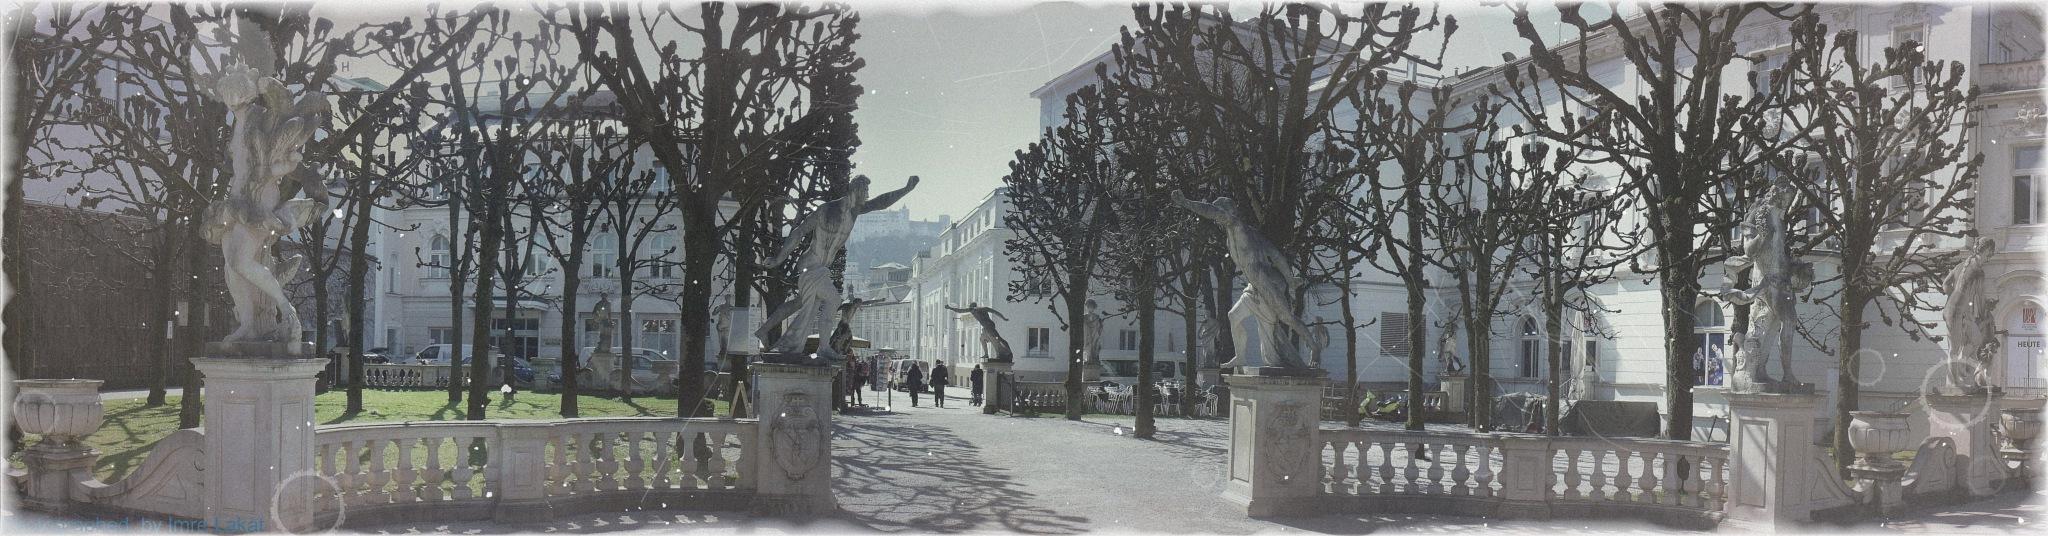 Mirabellgarten . Salzburg by Imre Lakat